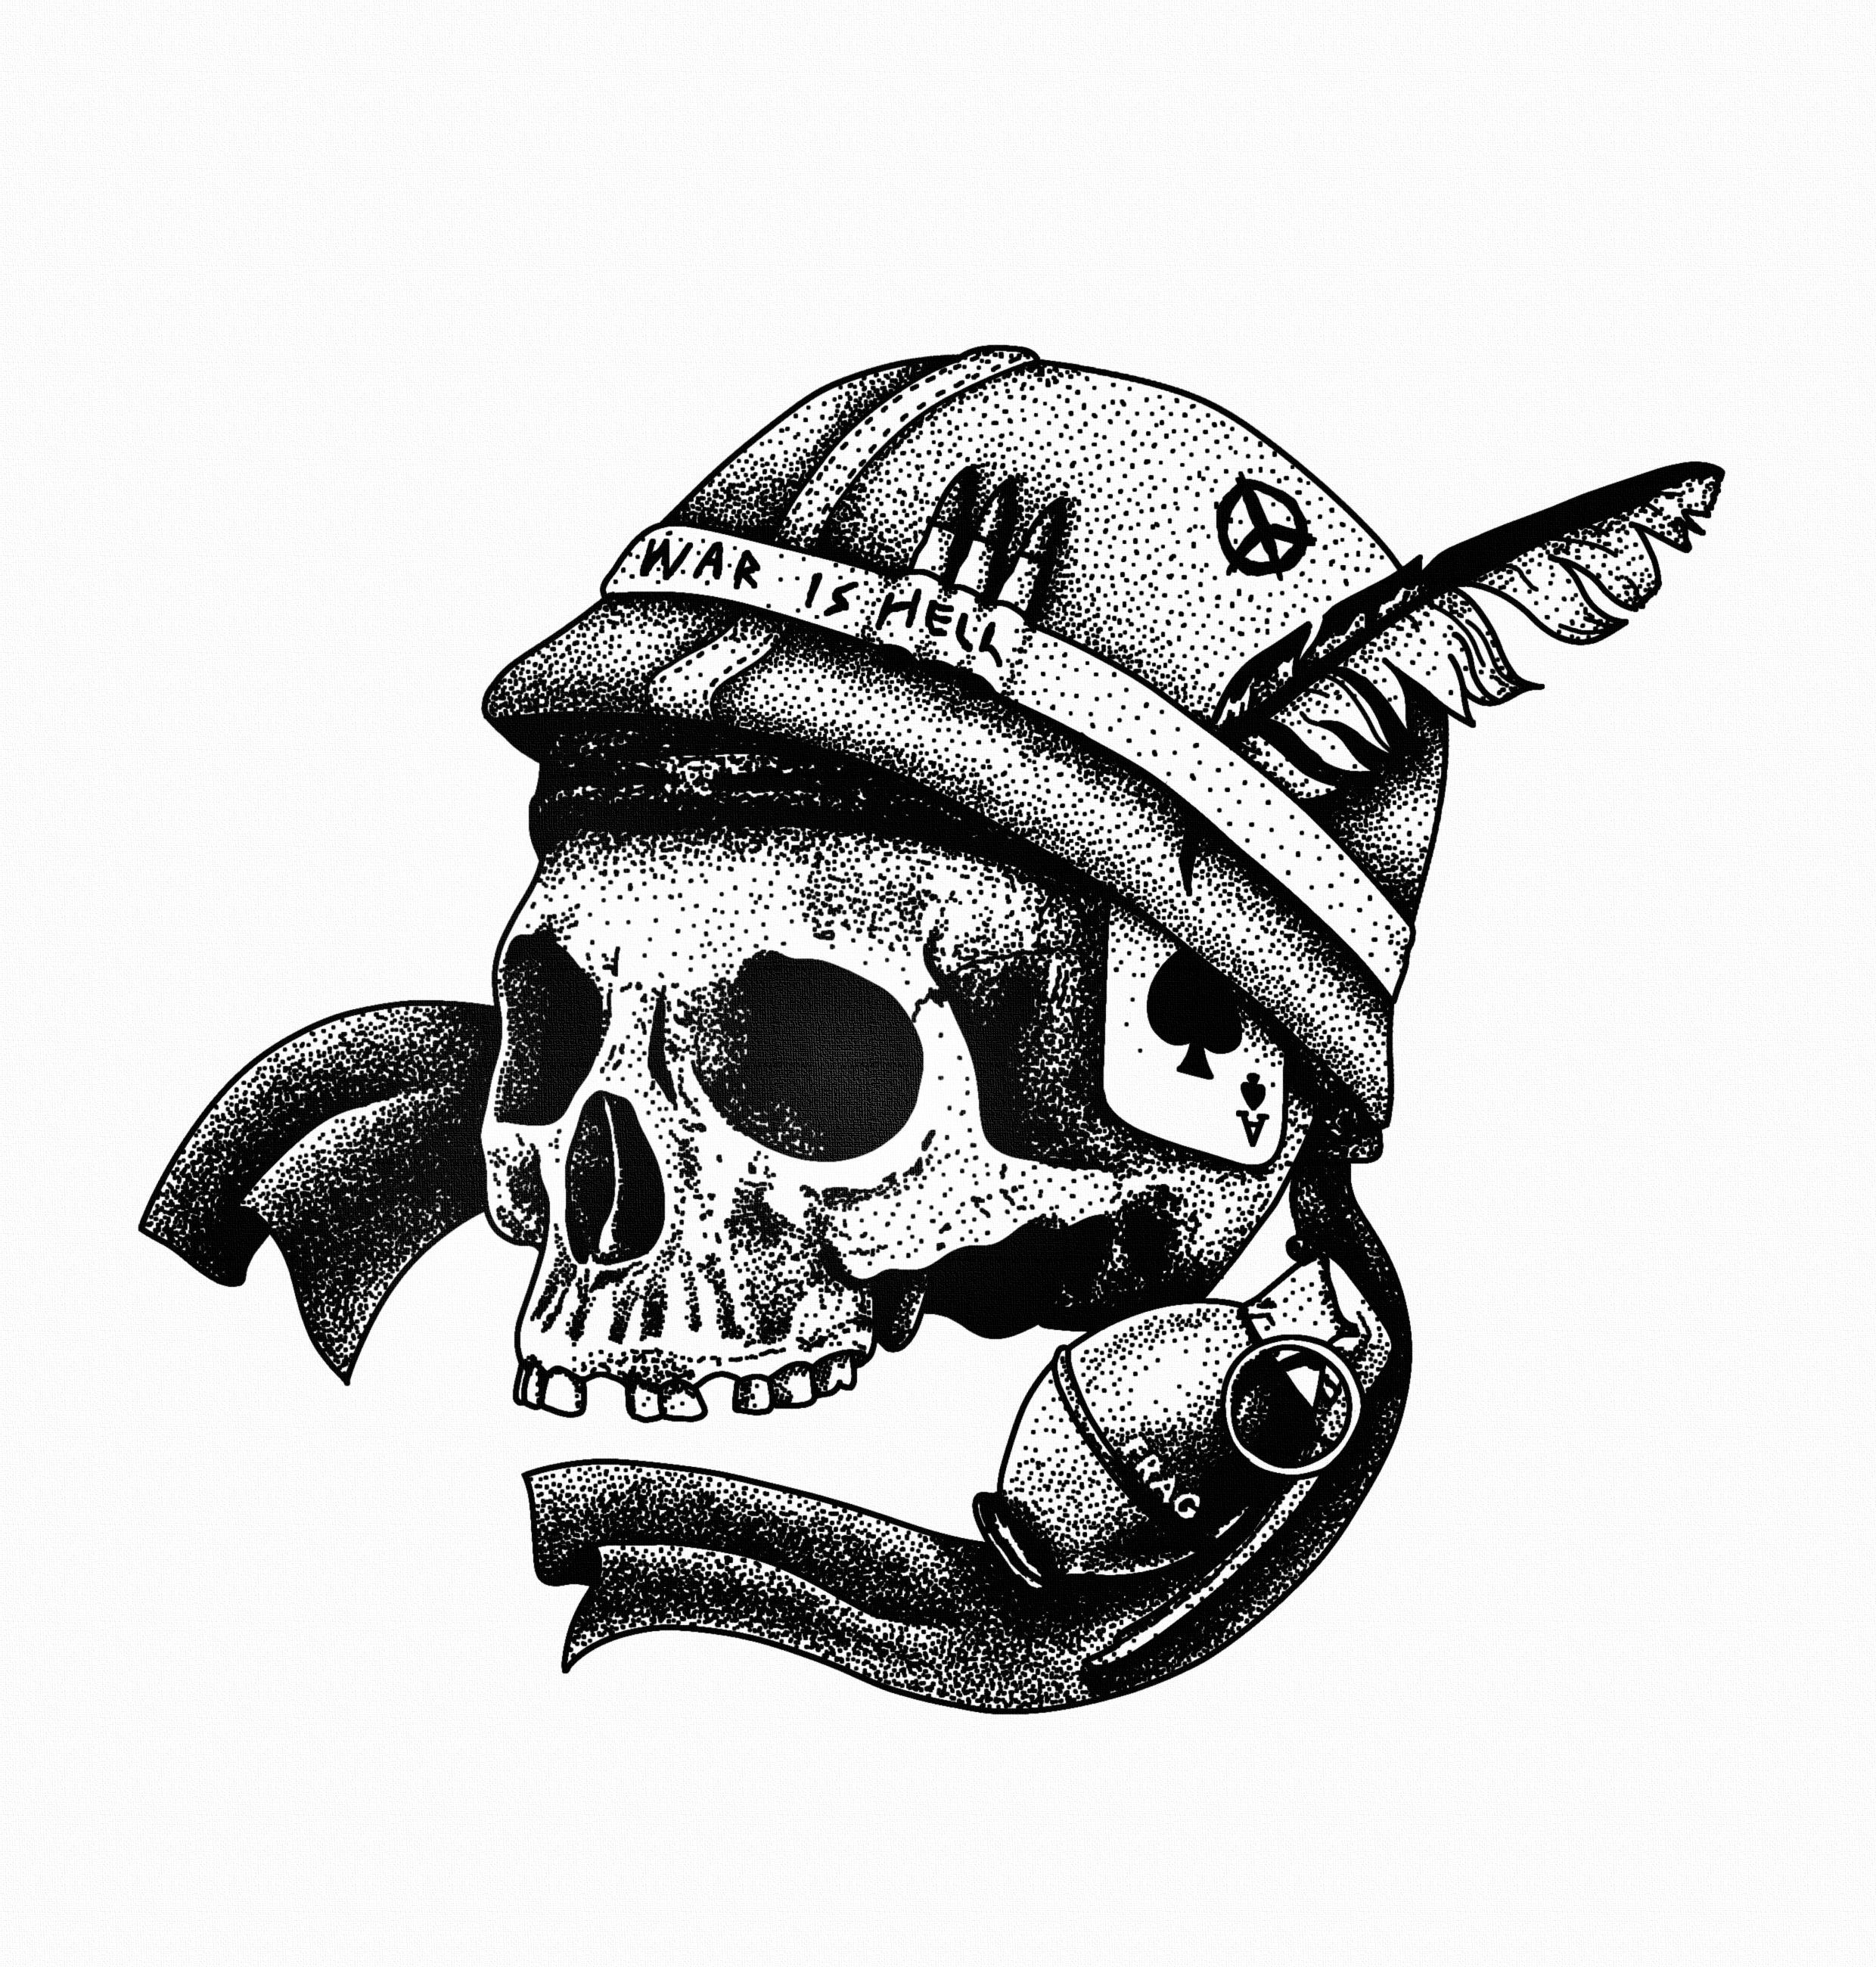 Stanley Duke Tattoo Illustration Design Blackwork Linework Dotwork Pointilism Stippling Bold Black White Skull Veitn War Tattoo Bullet Tattoo Military Drawings